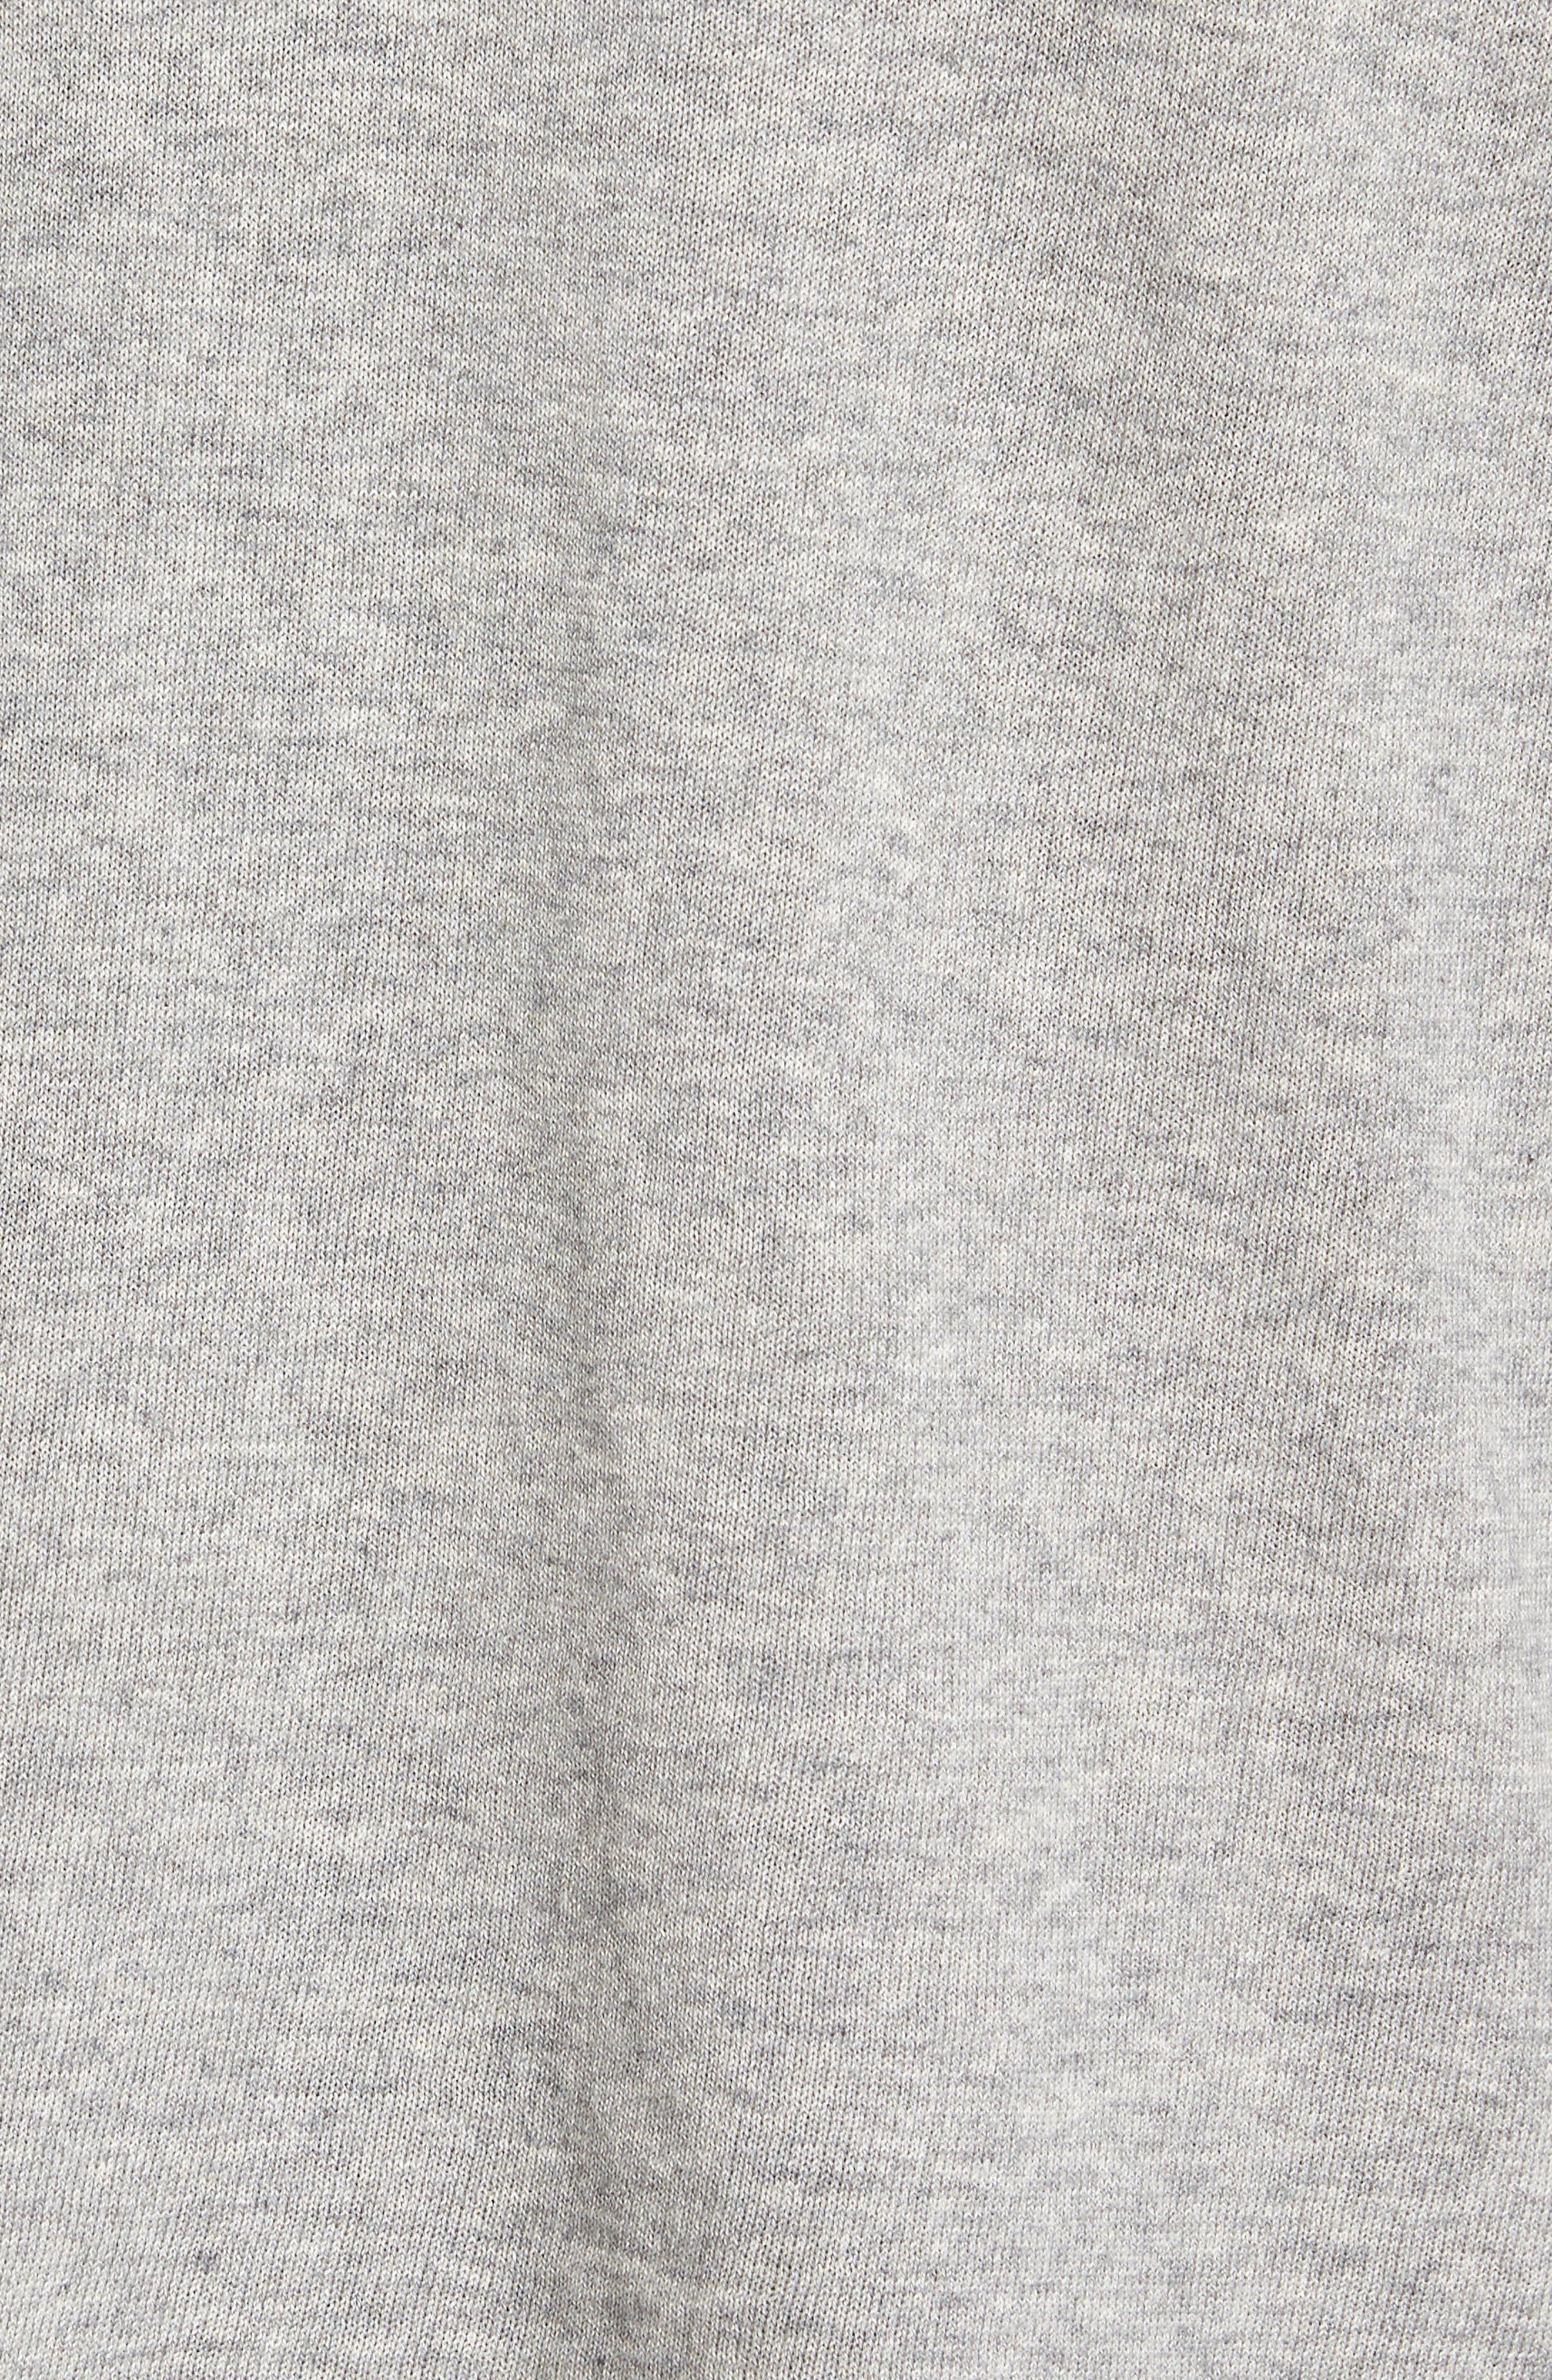 Hess Wool Turtleneck Sweater,                             Alternate thumbnail 9, color,